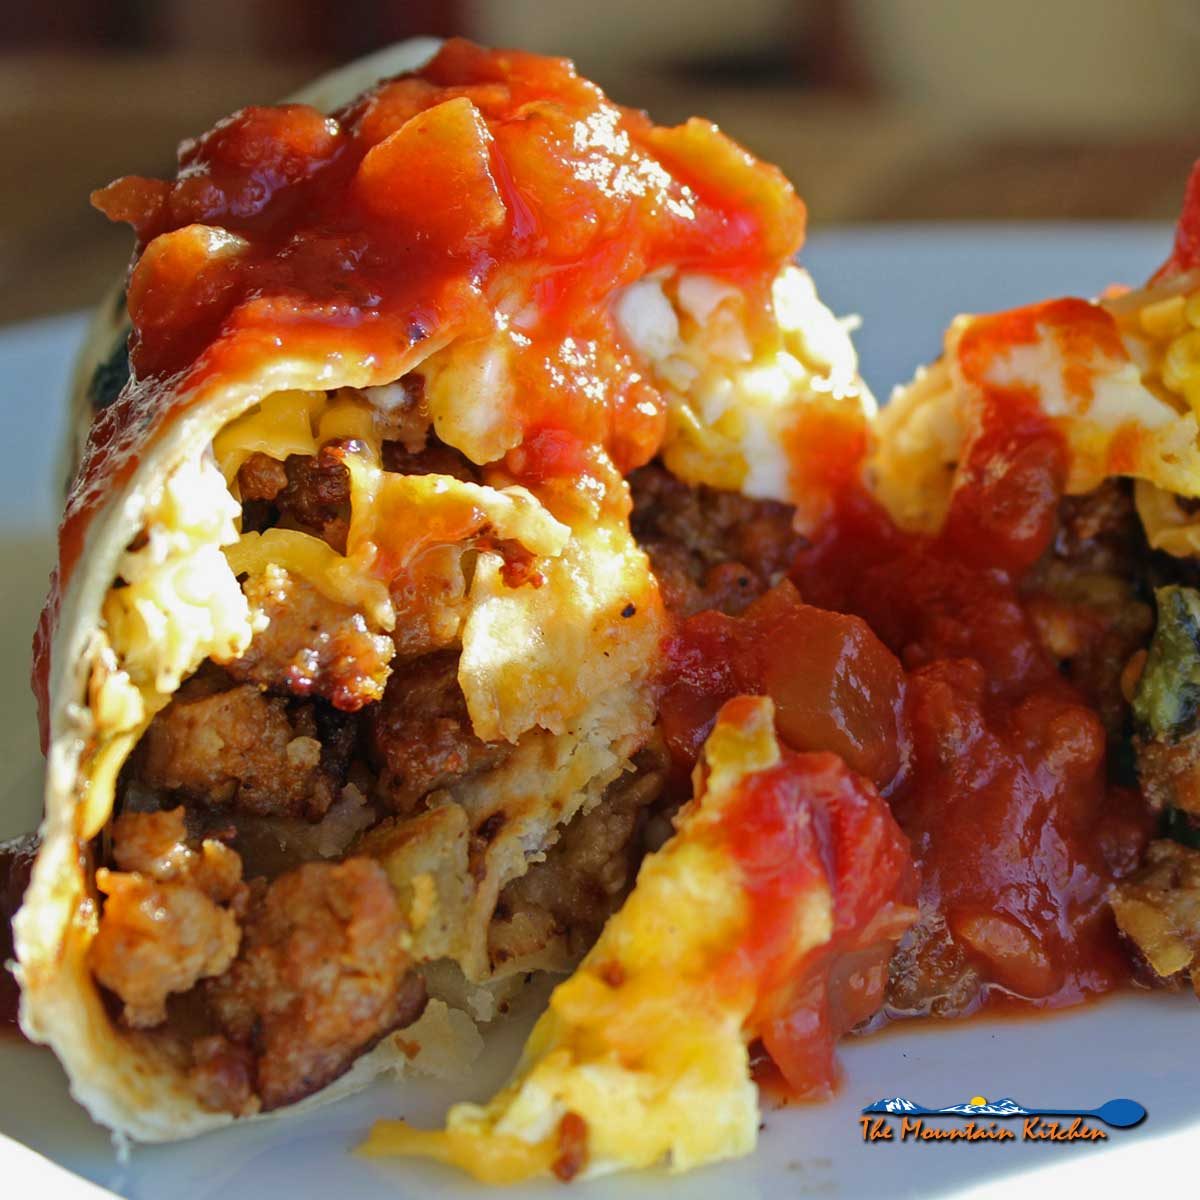 David's Breakfast Burritos